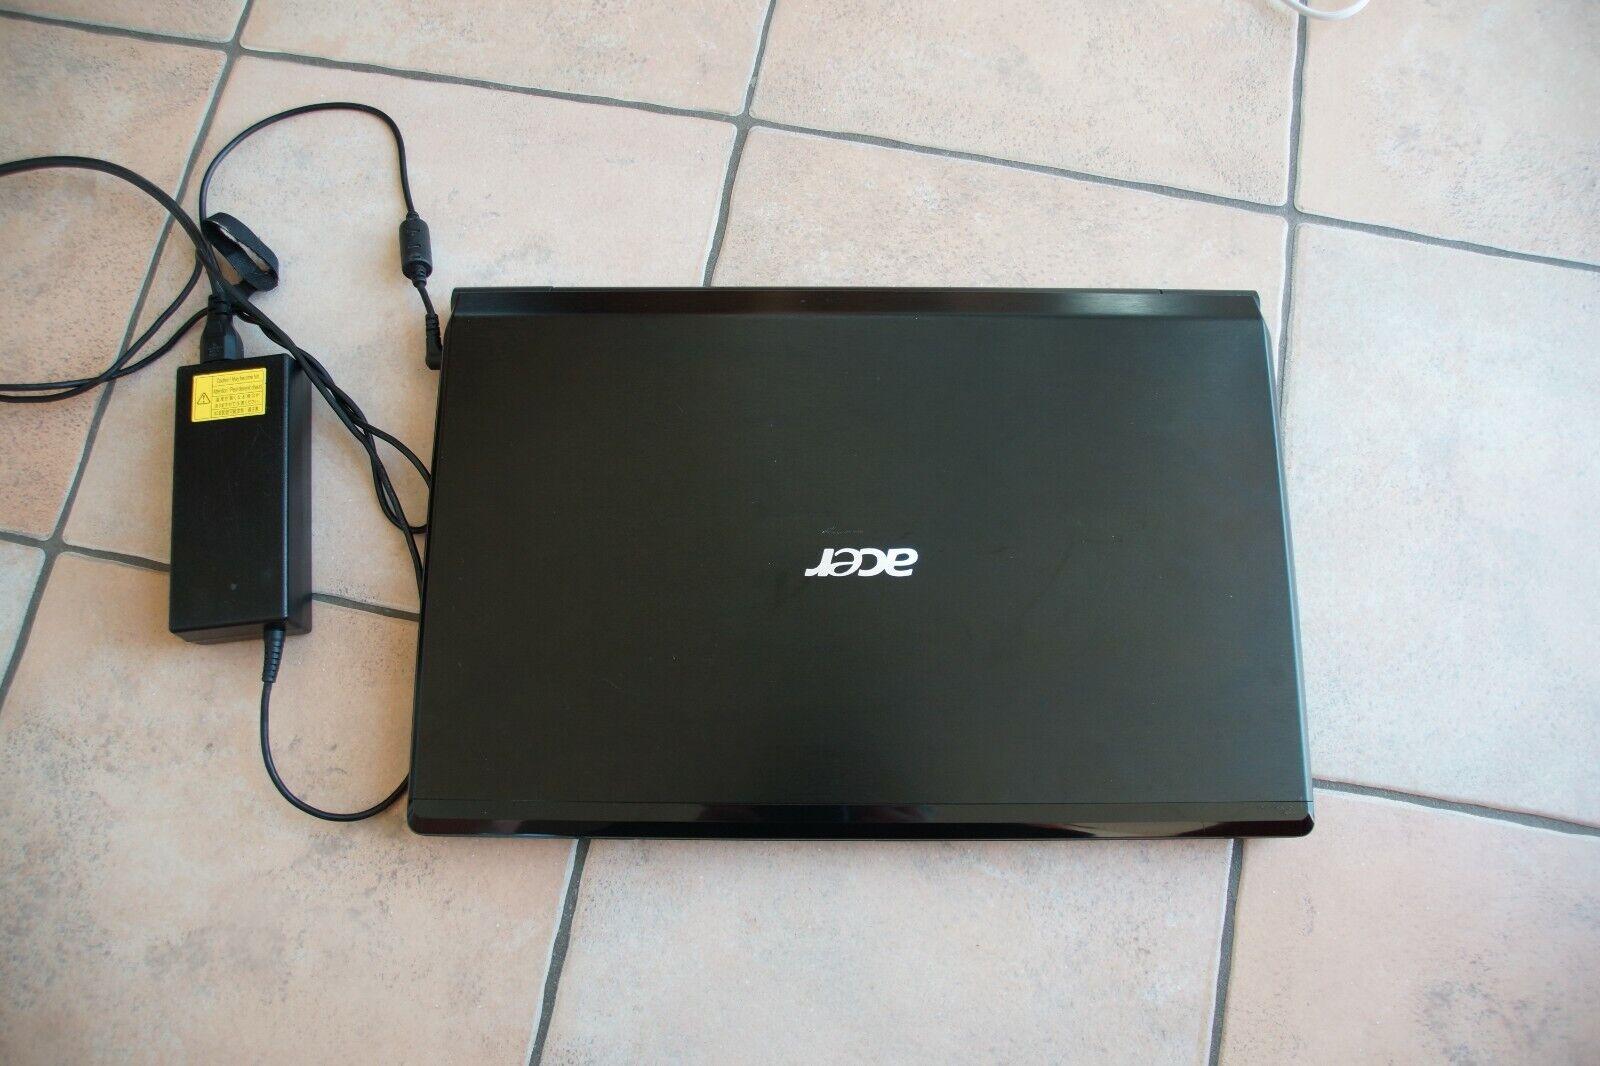 Notebook Acer aspire ethos 8951g,16GB RAM, 2x 512GB SSD Festplatte